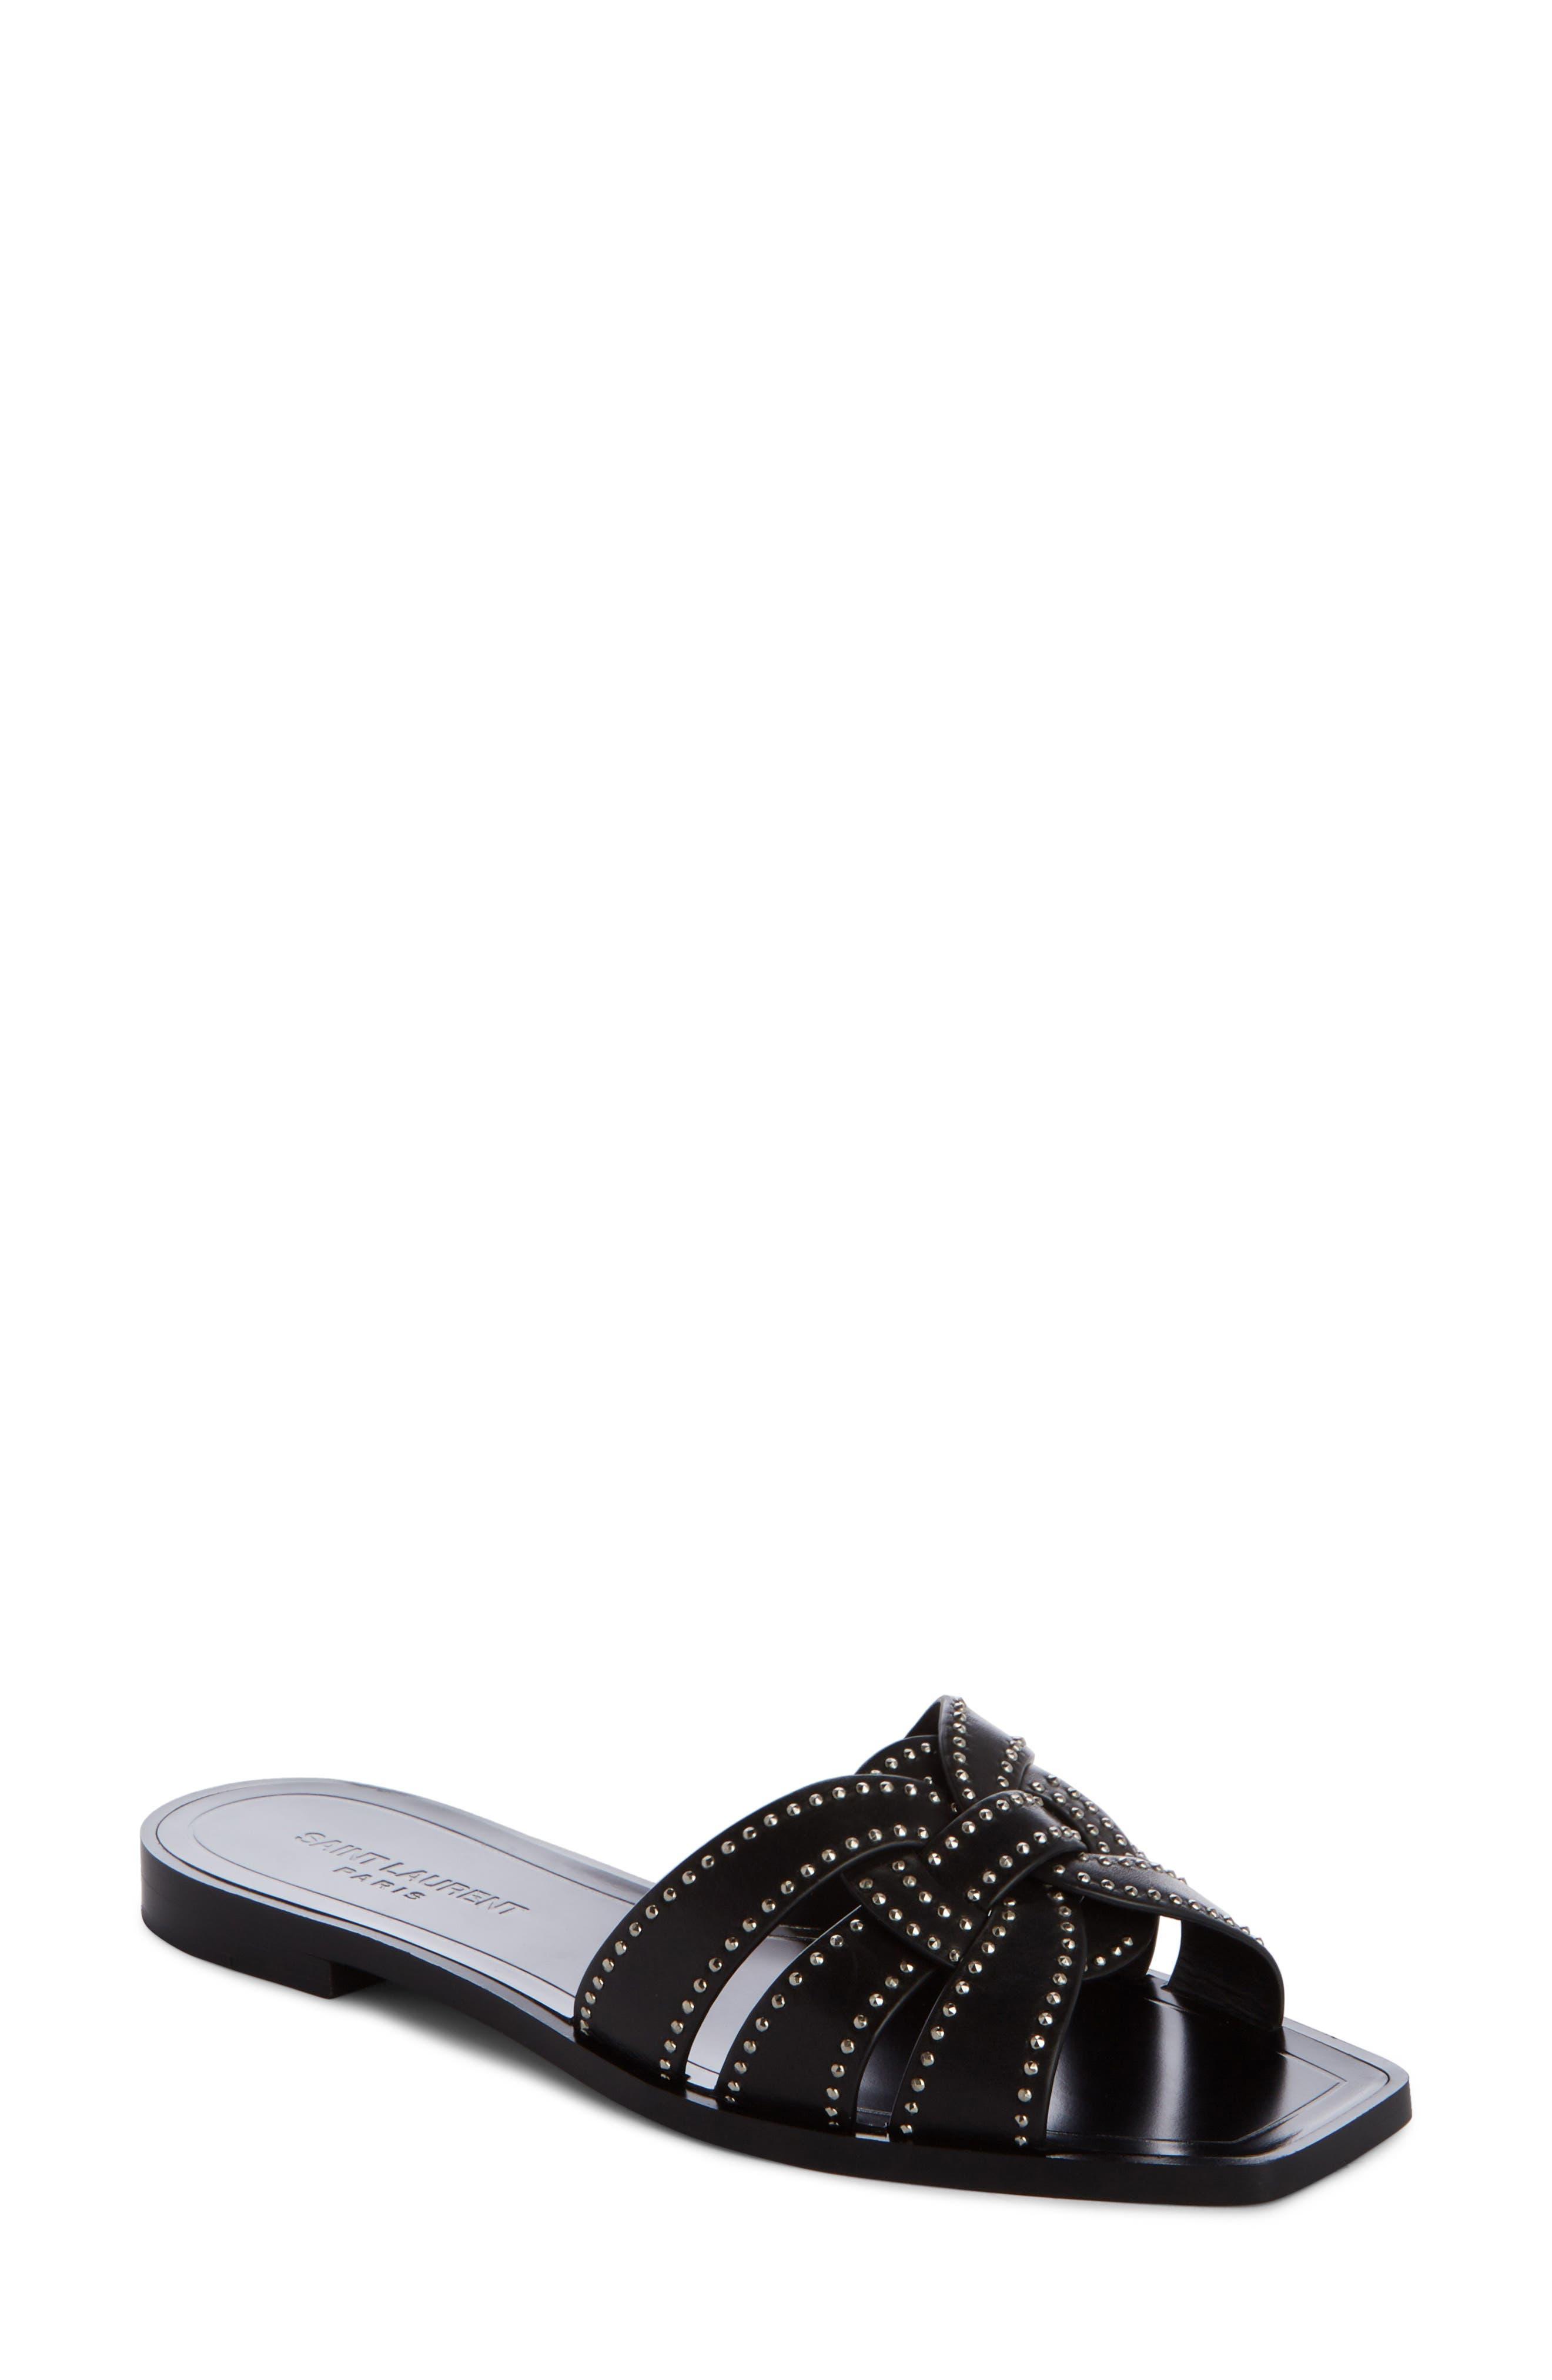 Nu Pieds Studded Slide Sandal,                             Main thumbnail 1, color,                             Black